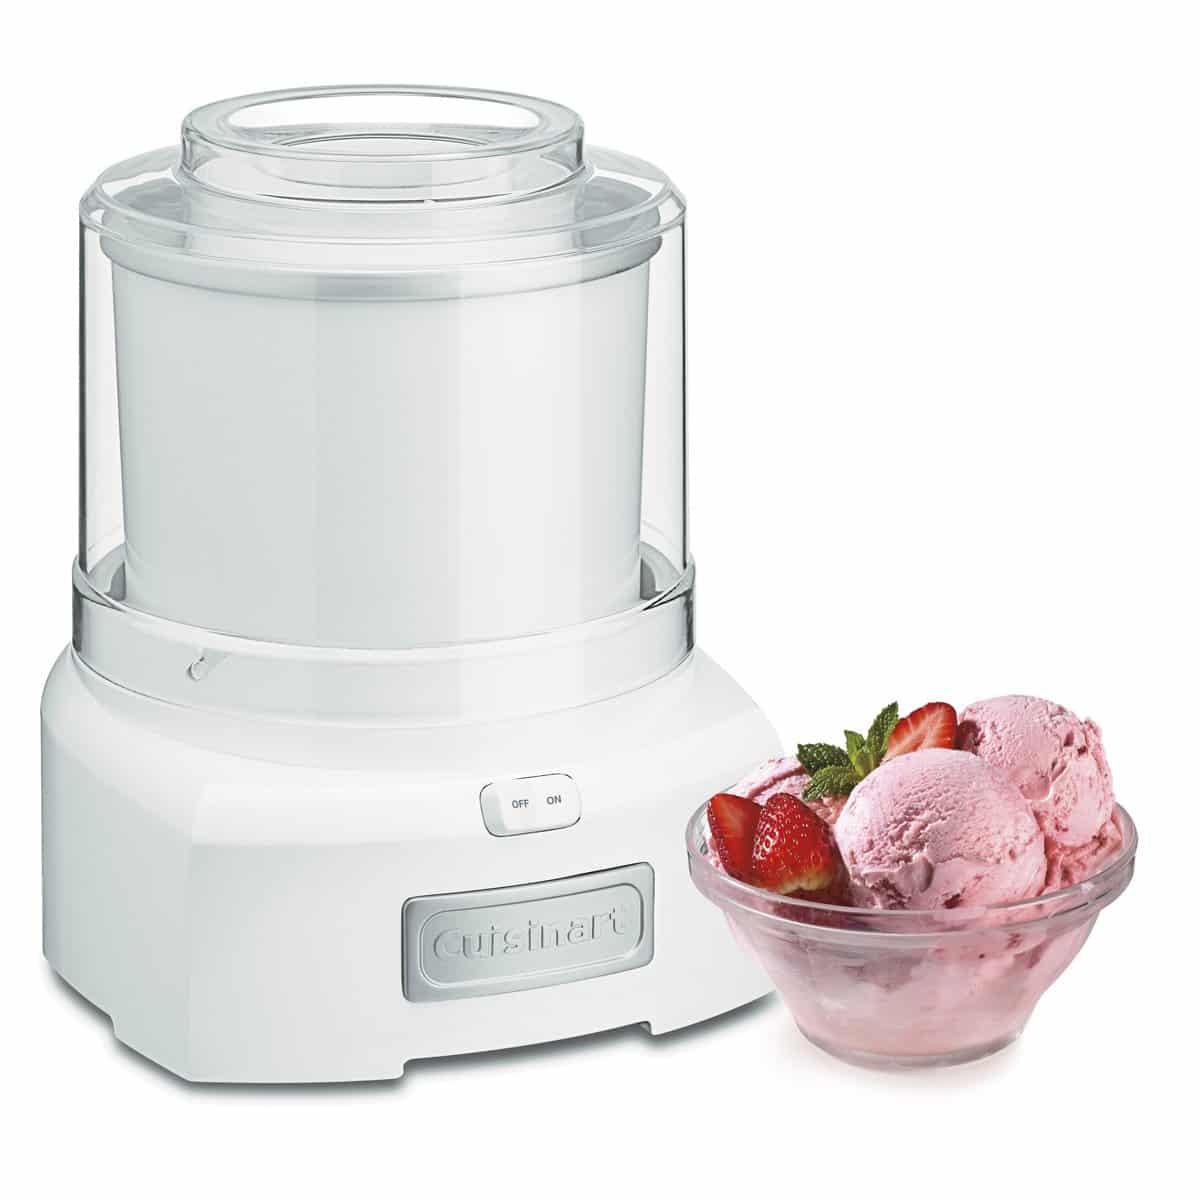 Cuisinart ICE-21 Ice-Cream Maker